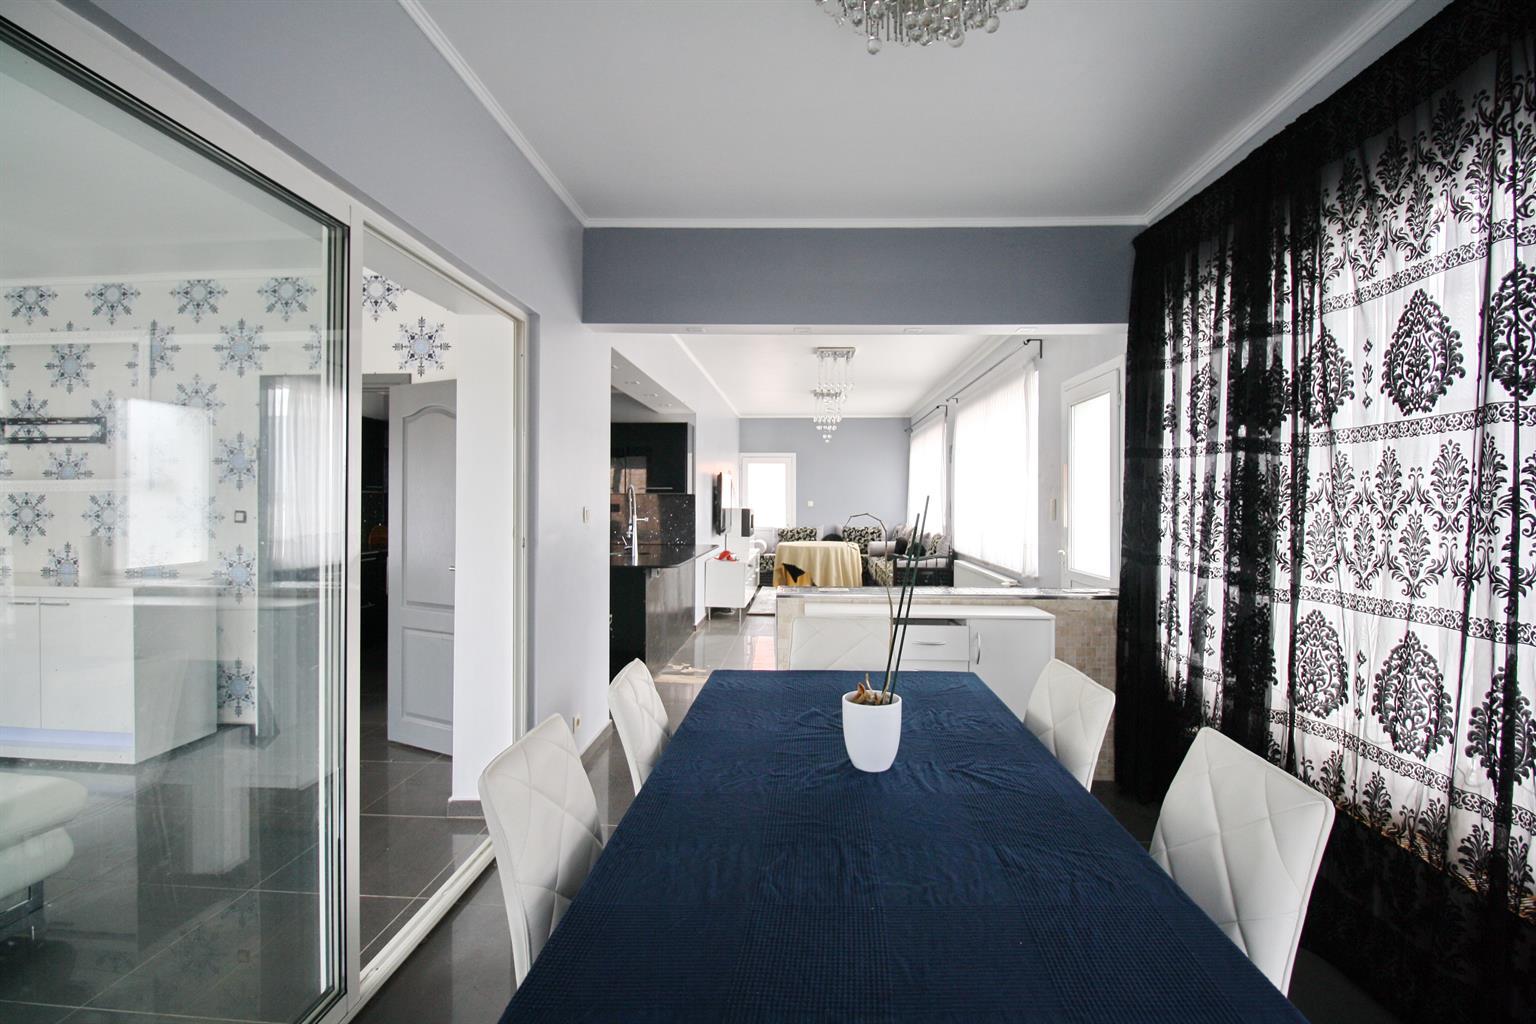 Maison - Roosdaal - #4363070-4